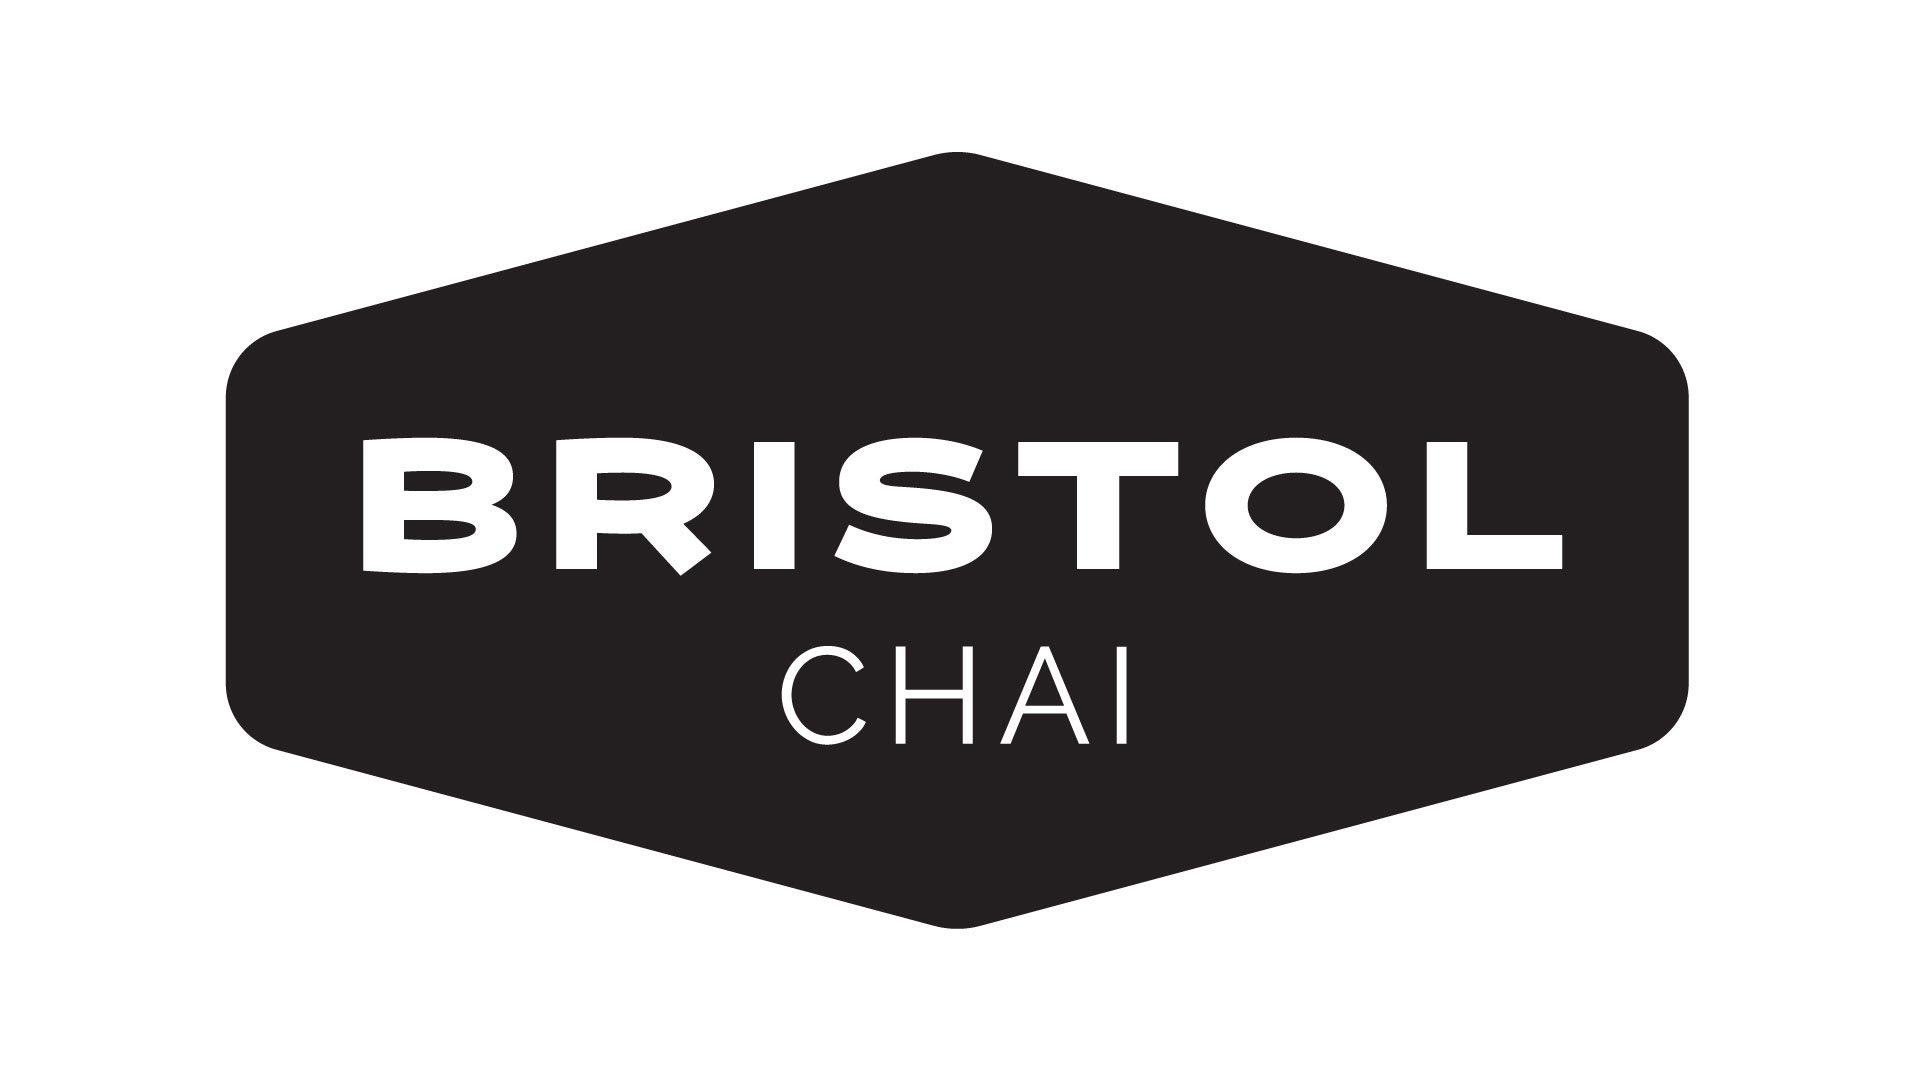 bristol chai logo